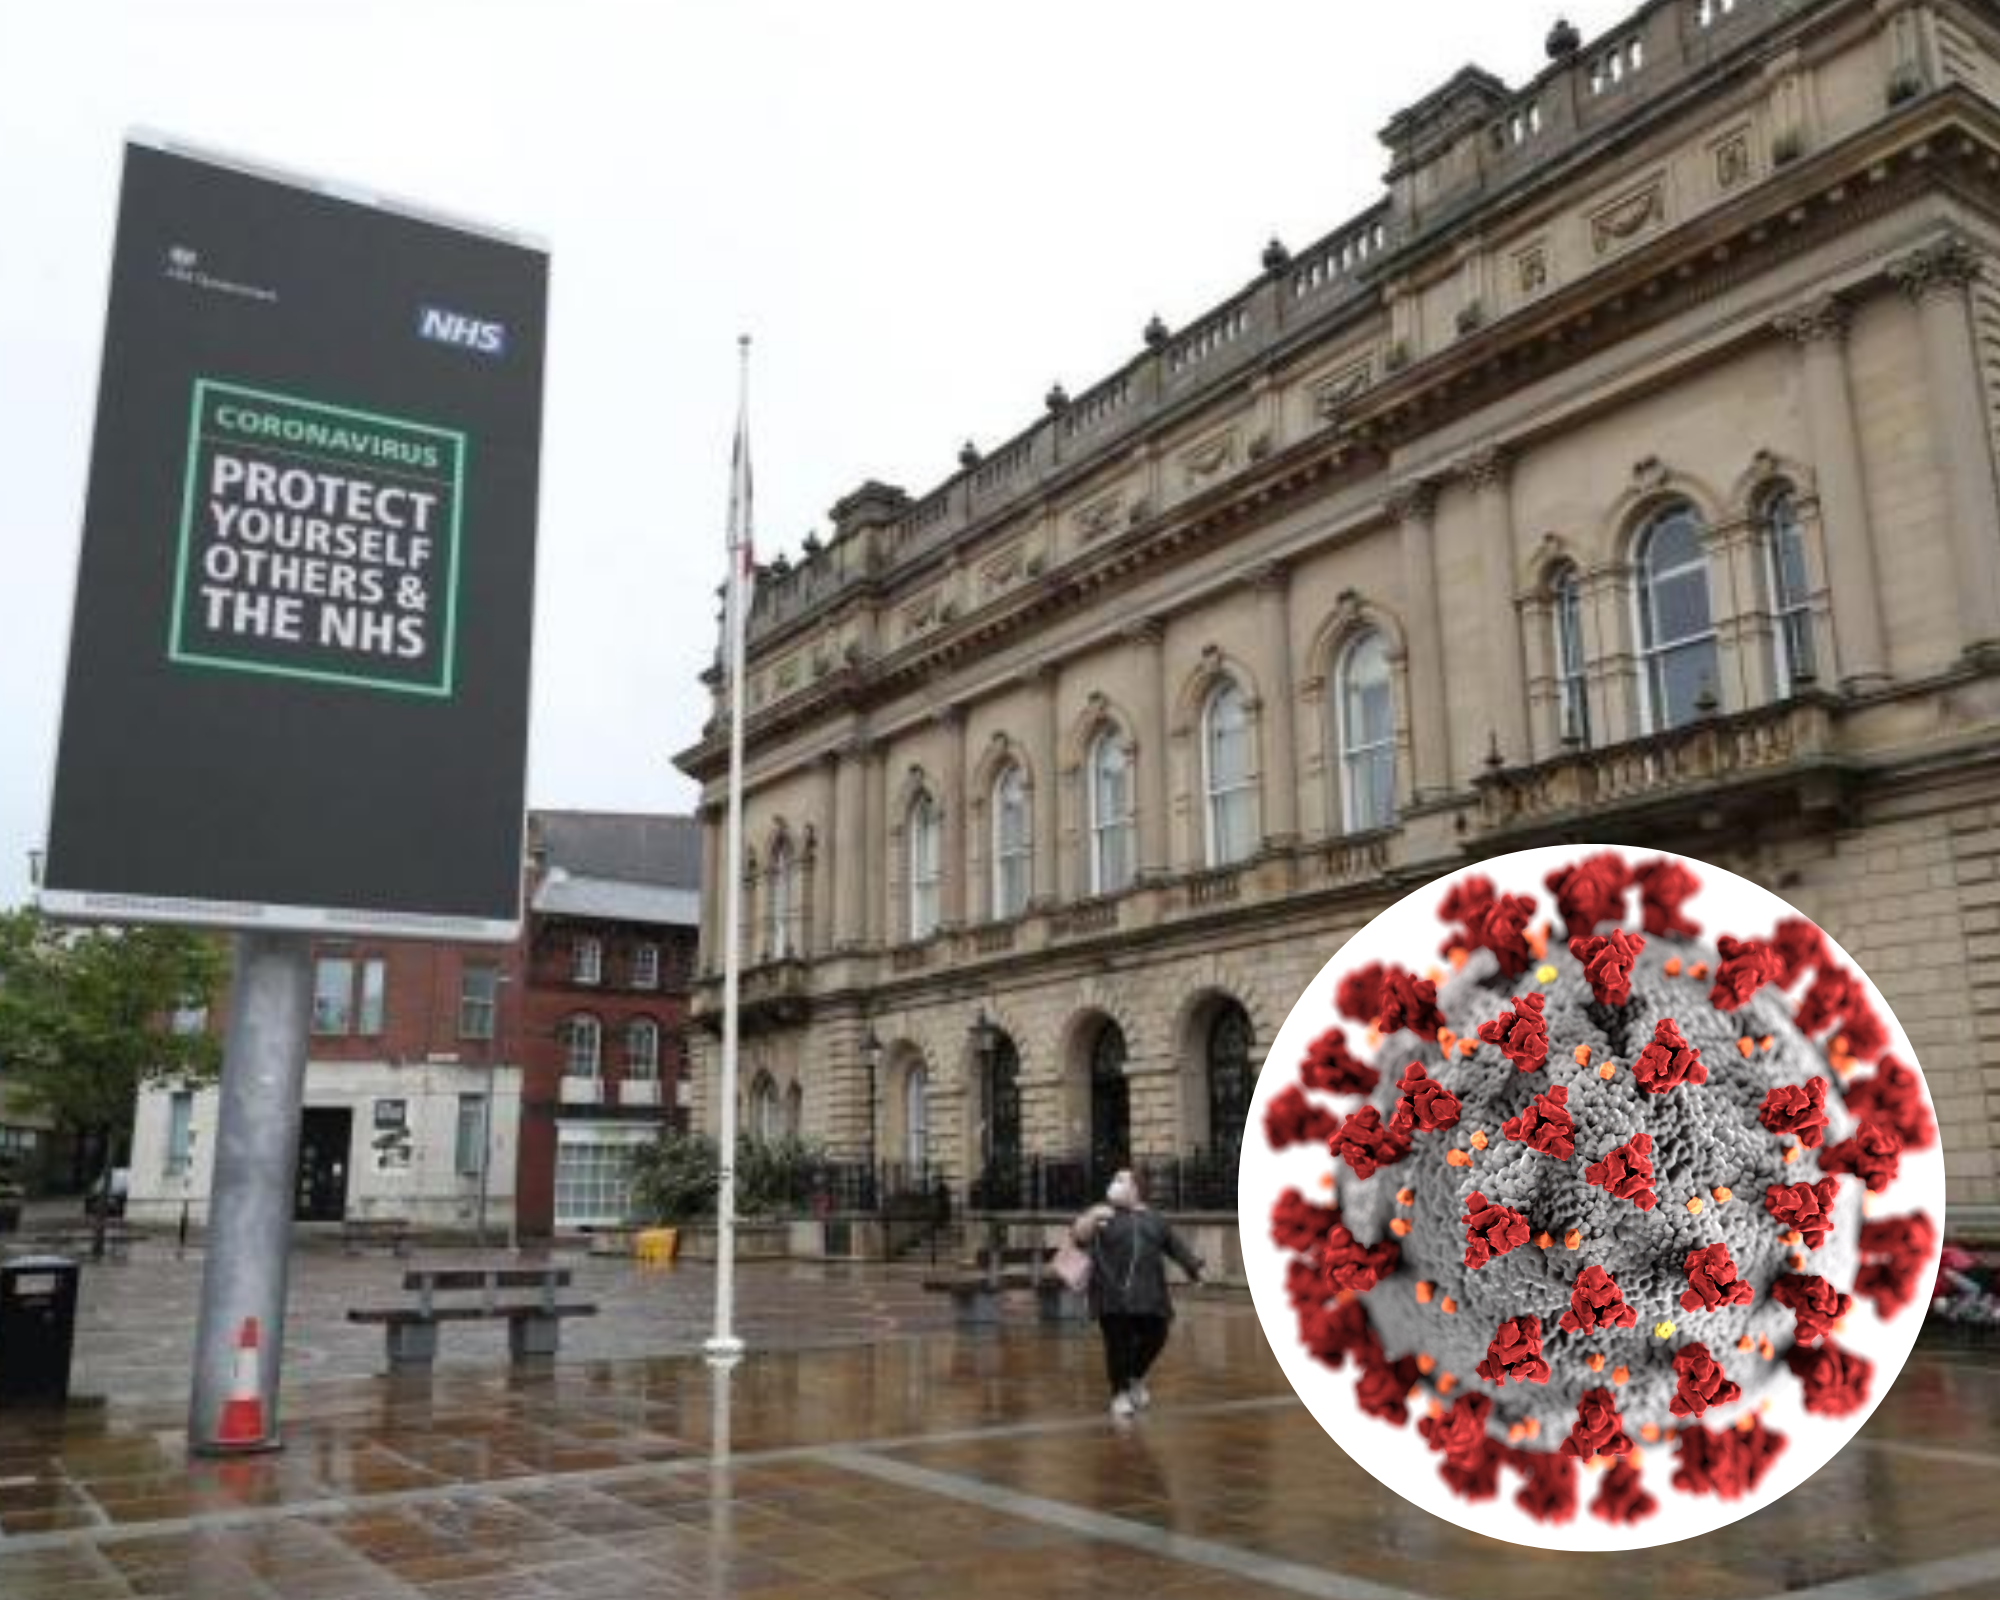 Blackburn now has the highest coronavirus infection rate